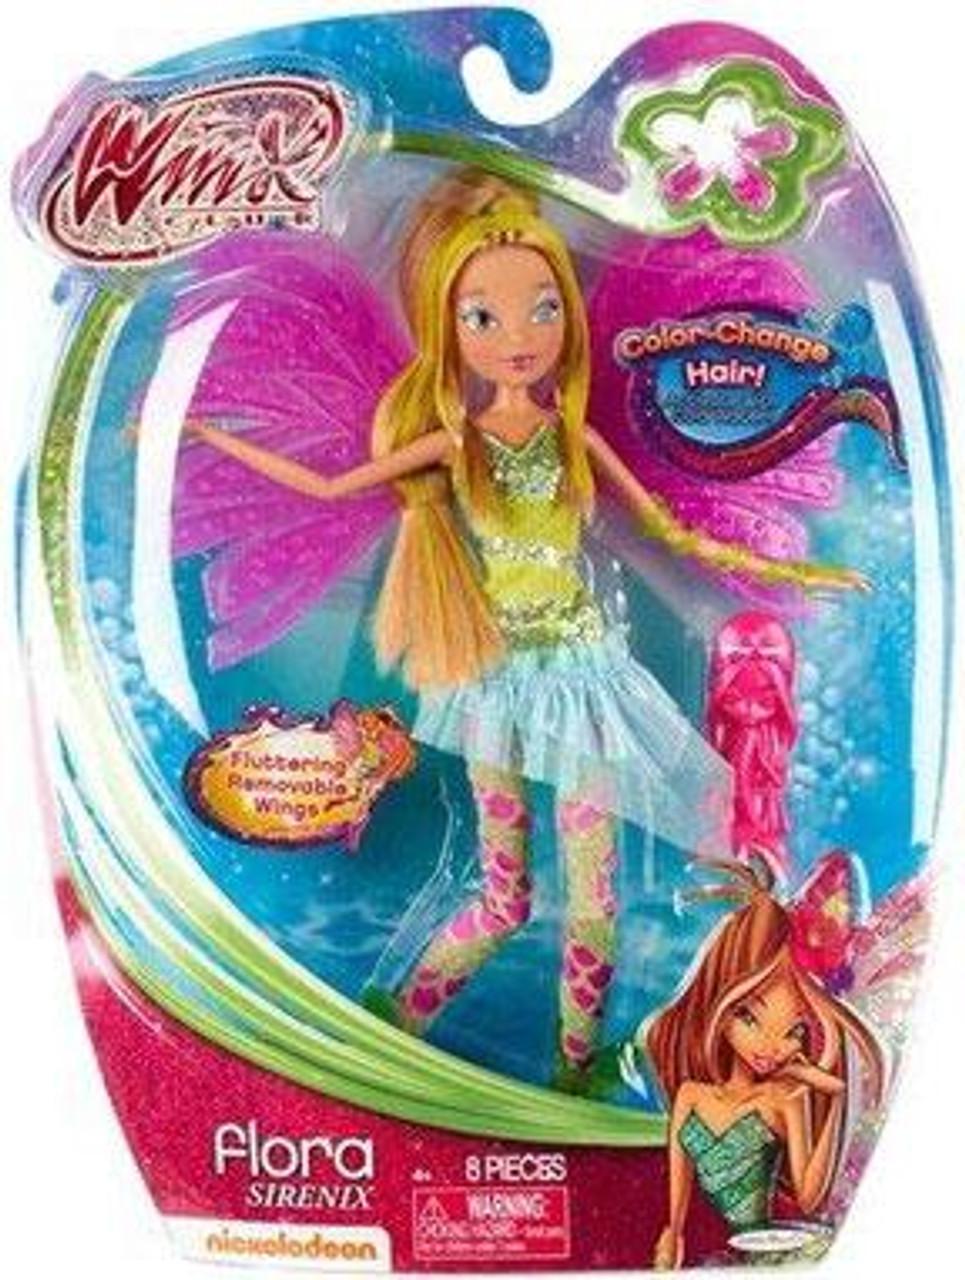 Winx Club Sirenix Flora 11.5-Inch Doll